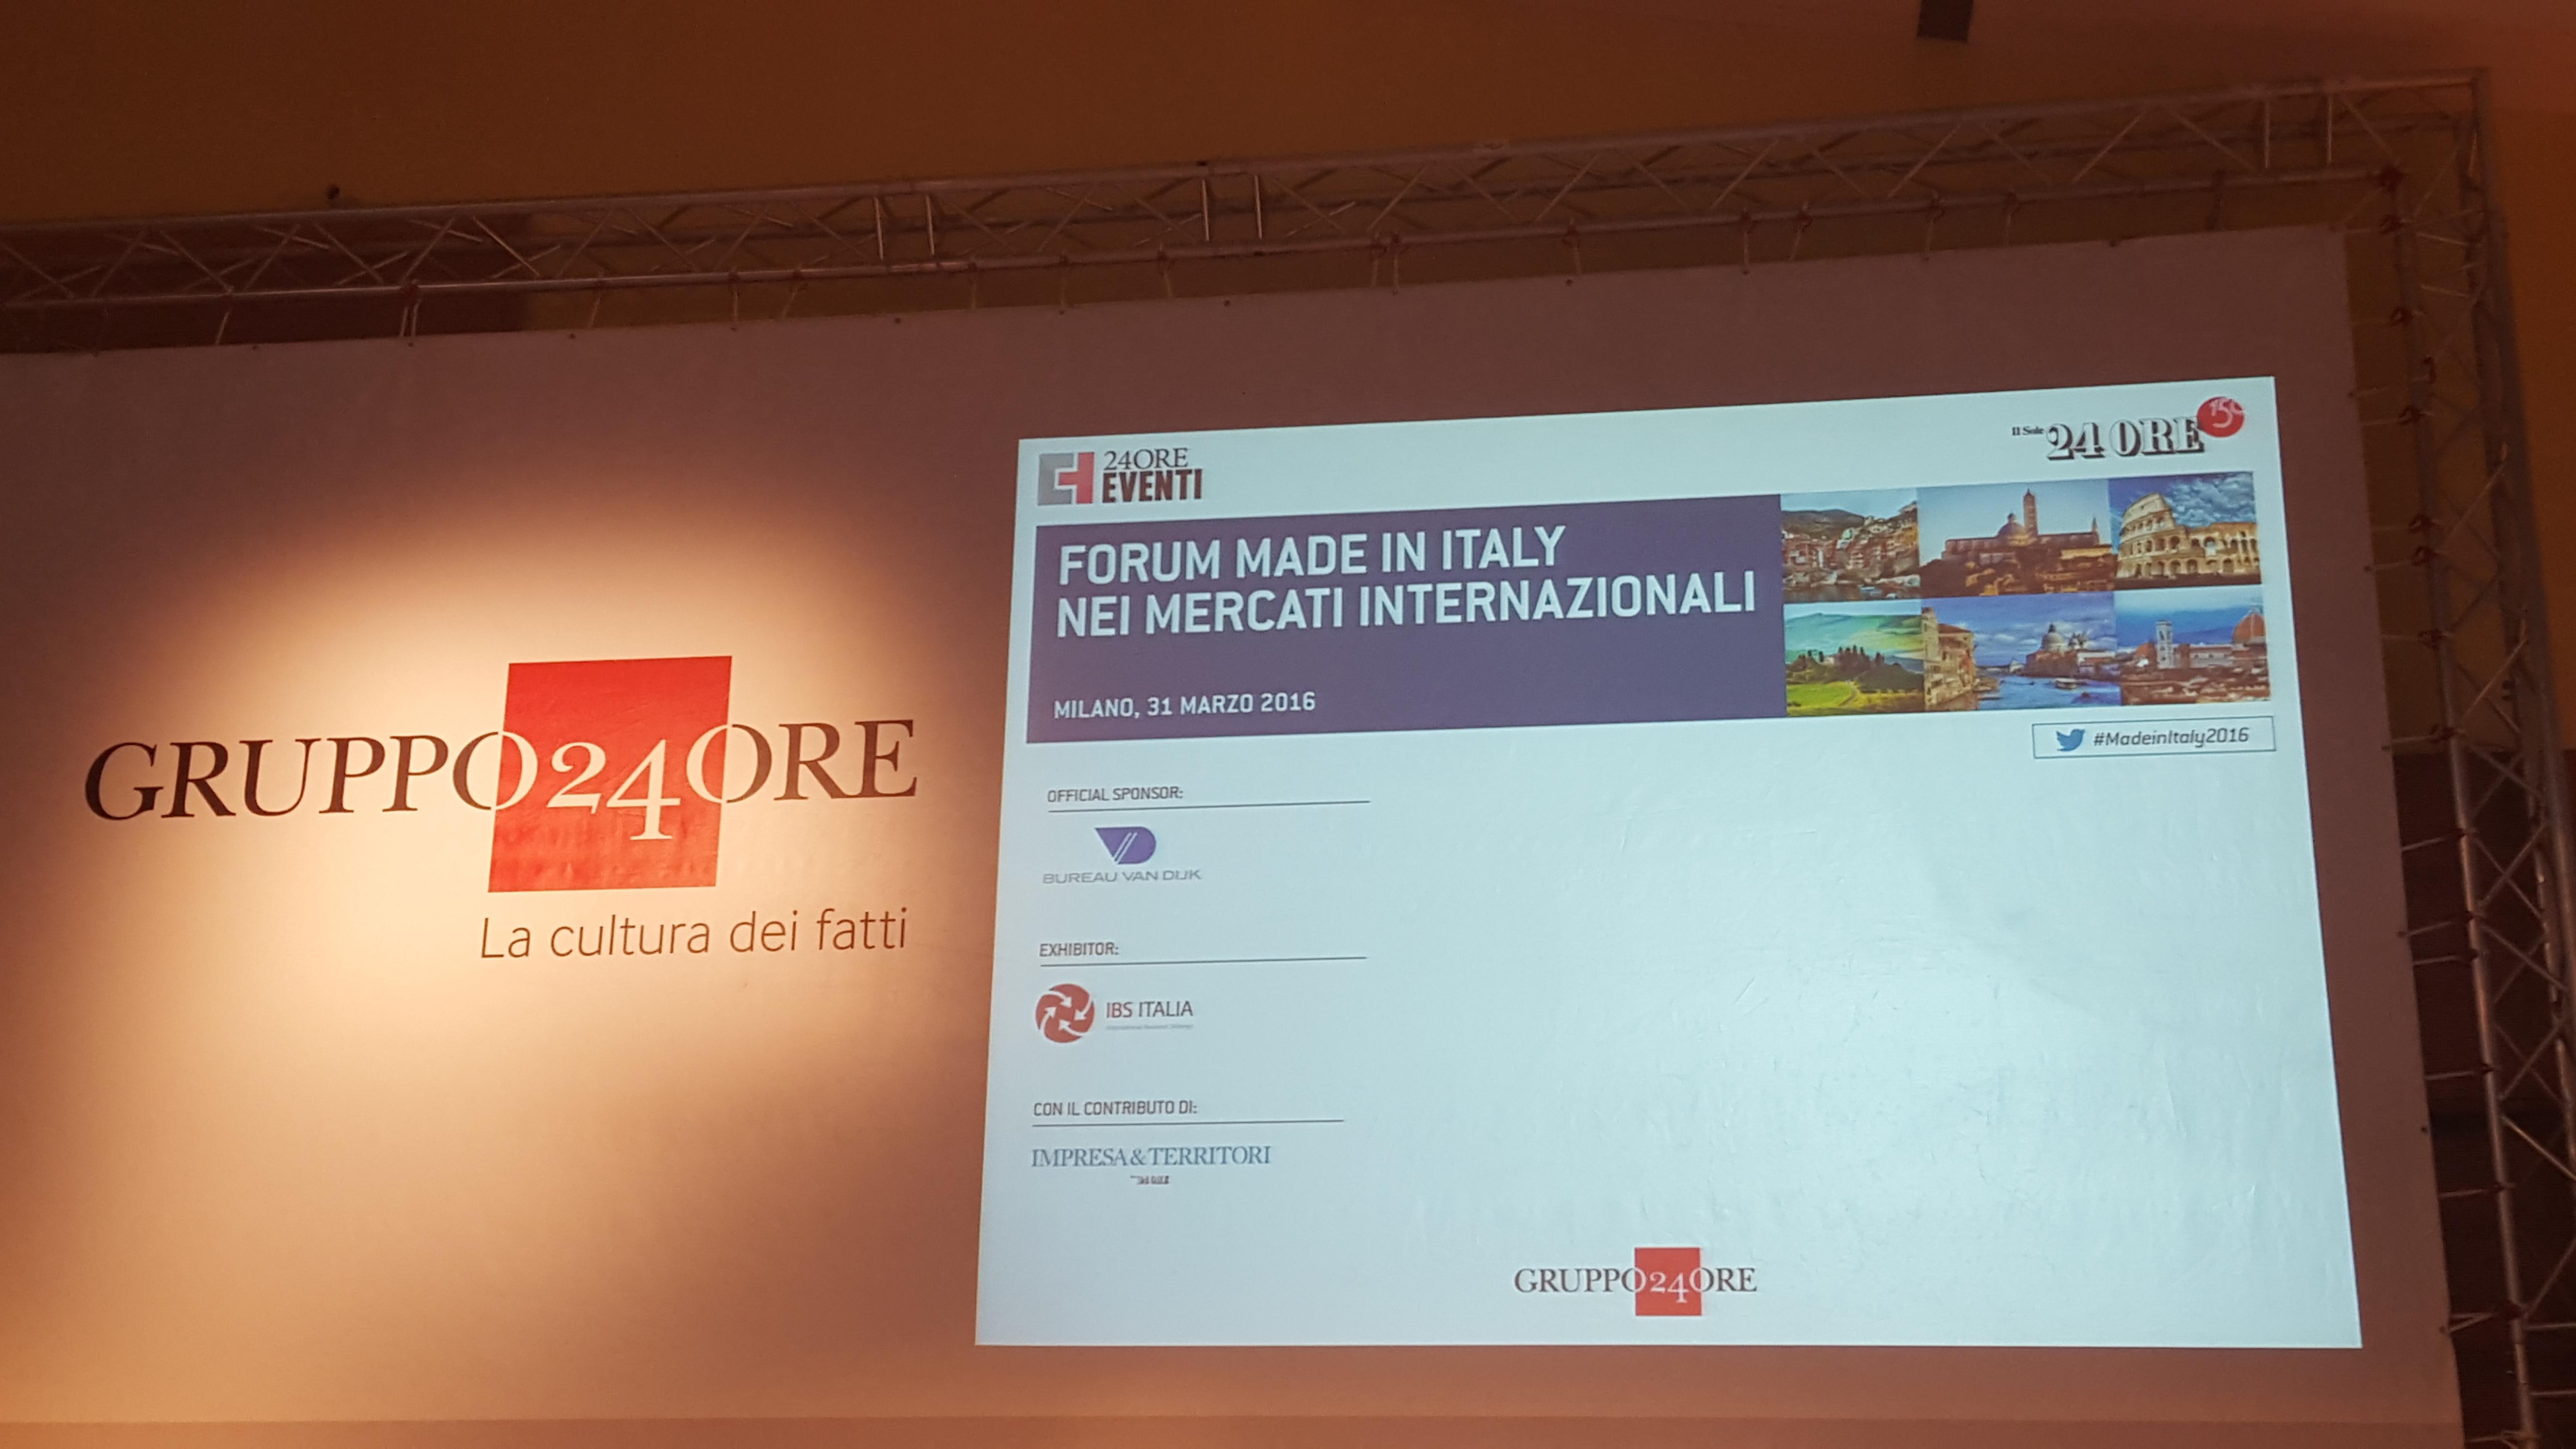 Forum Made in Italy nei mercati internazionali -